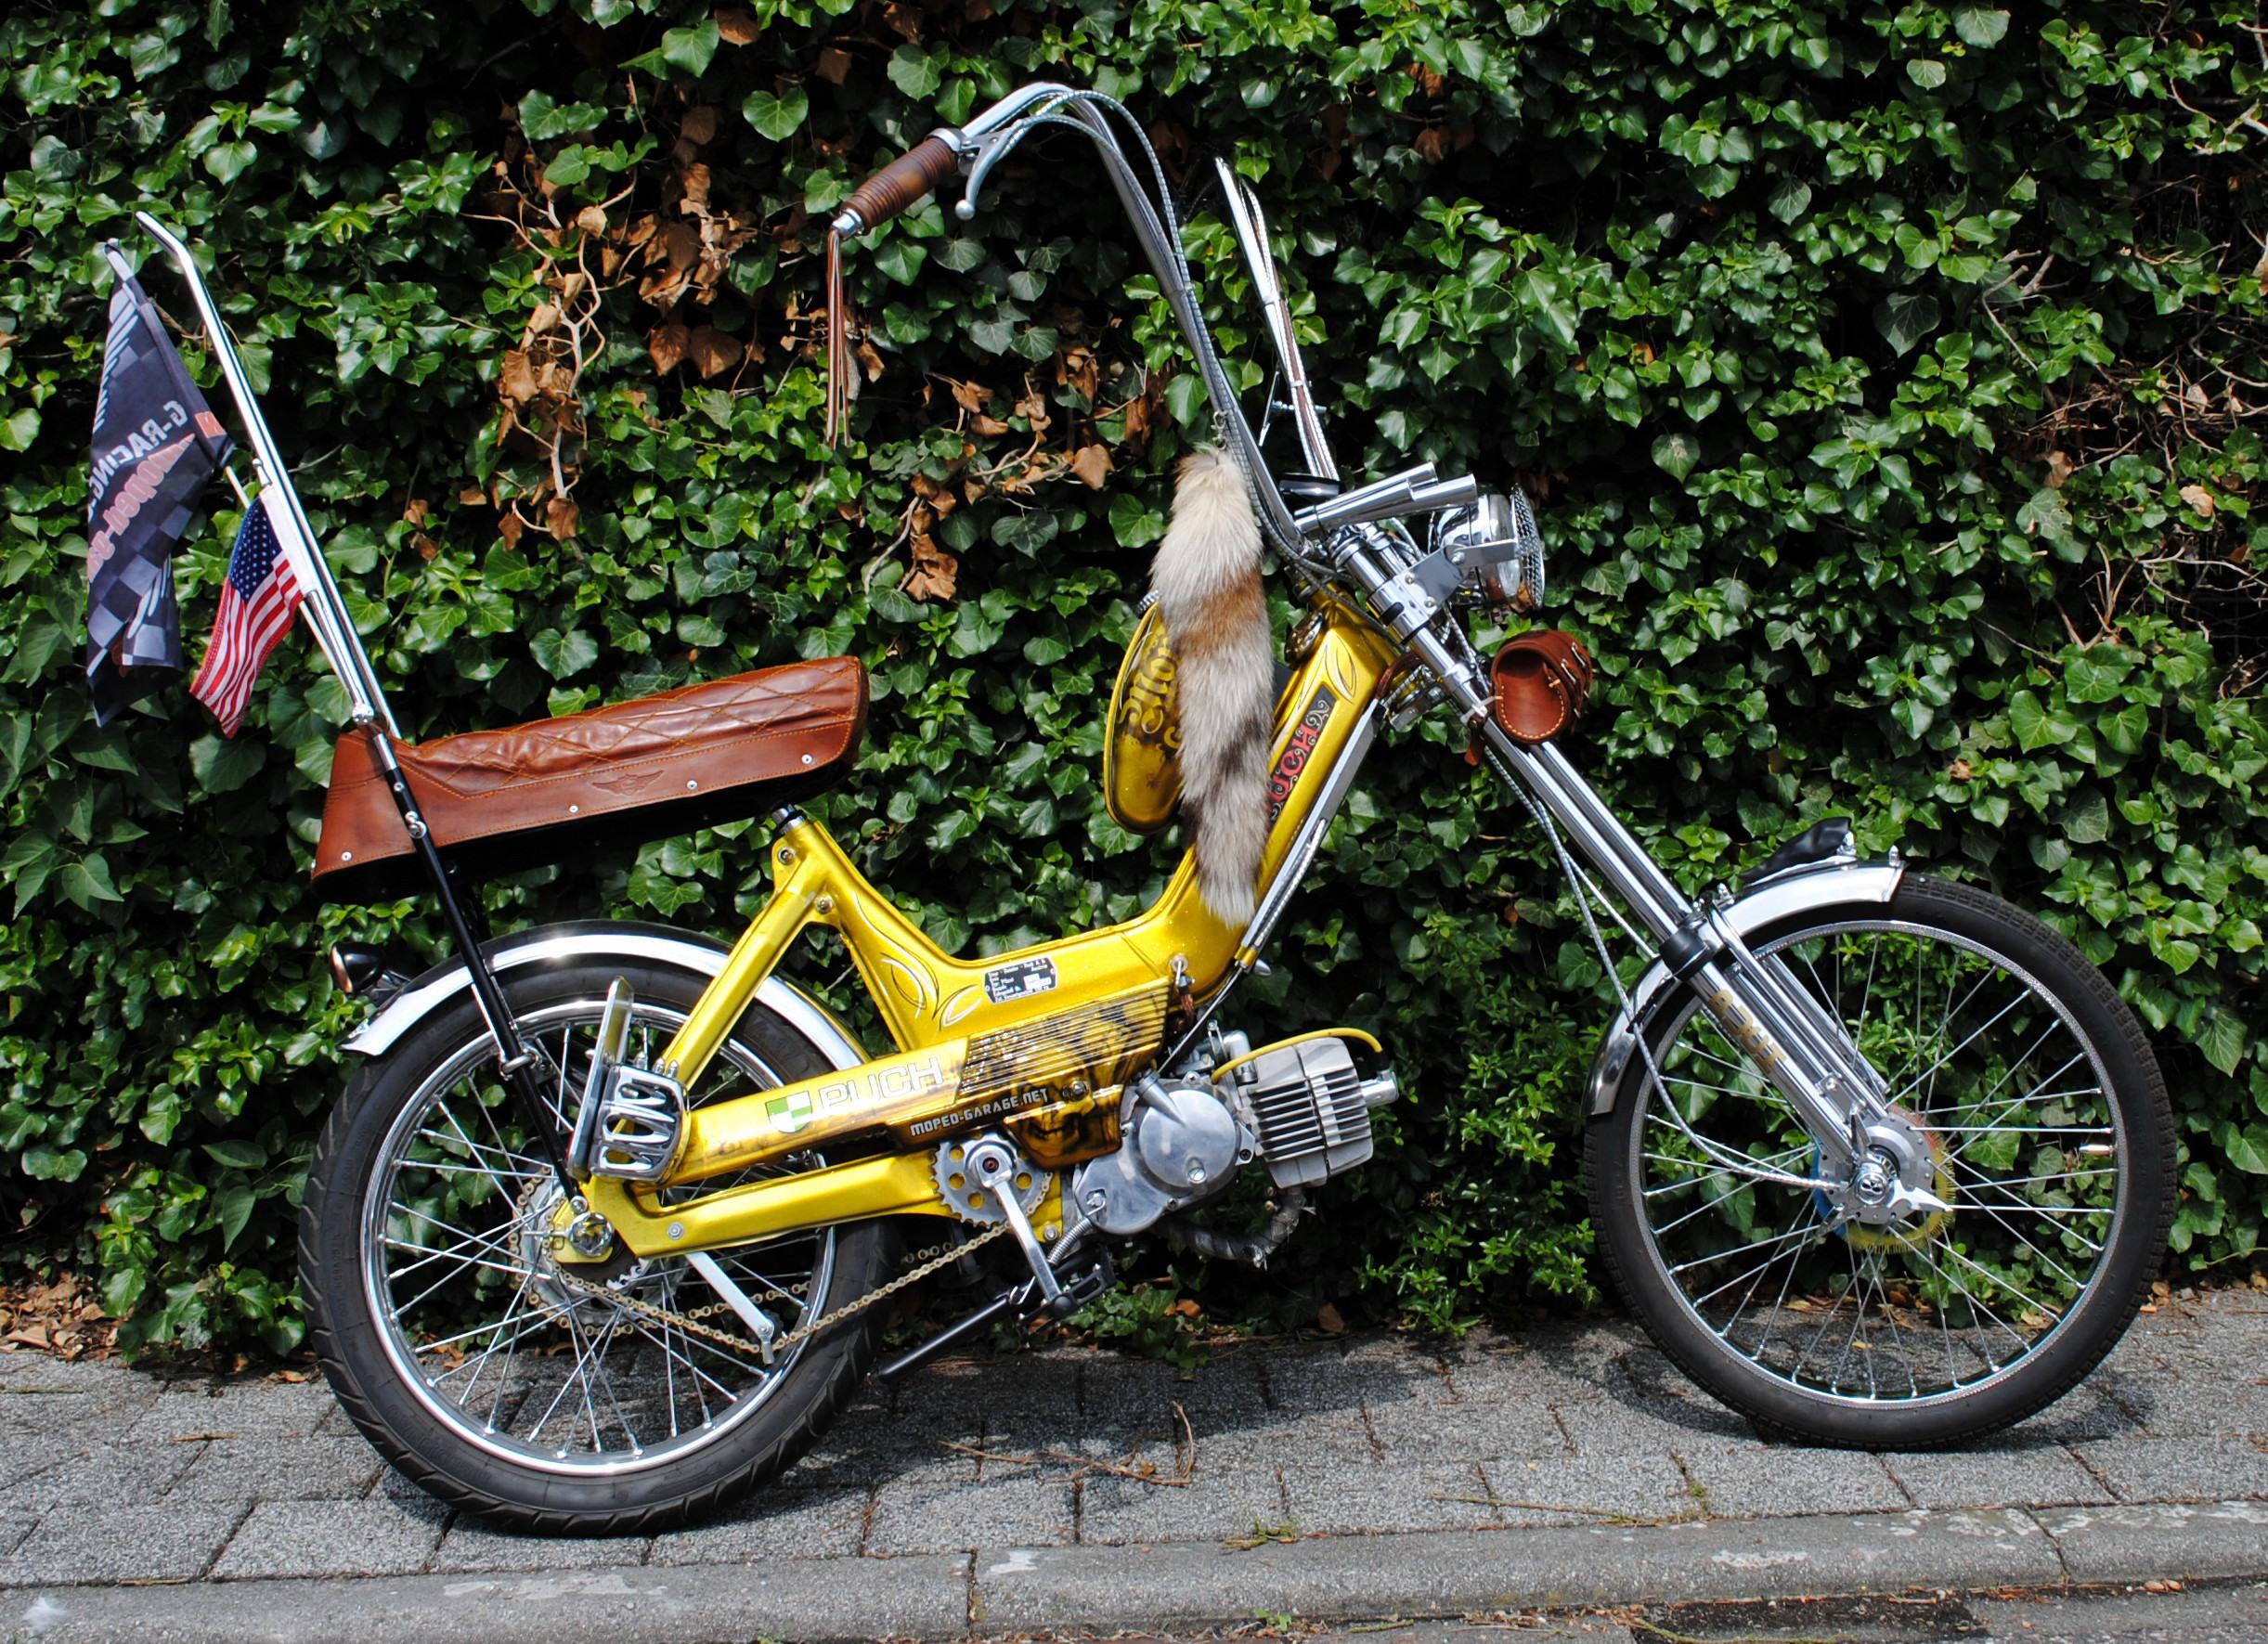 moped puch maxi s n x 30 schwarze chopper. Black Bedroom Furniture Sets. Home Design Ideas